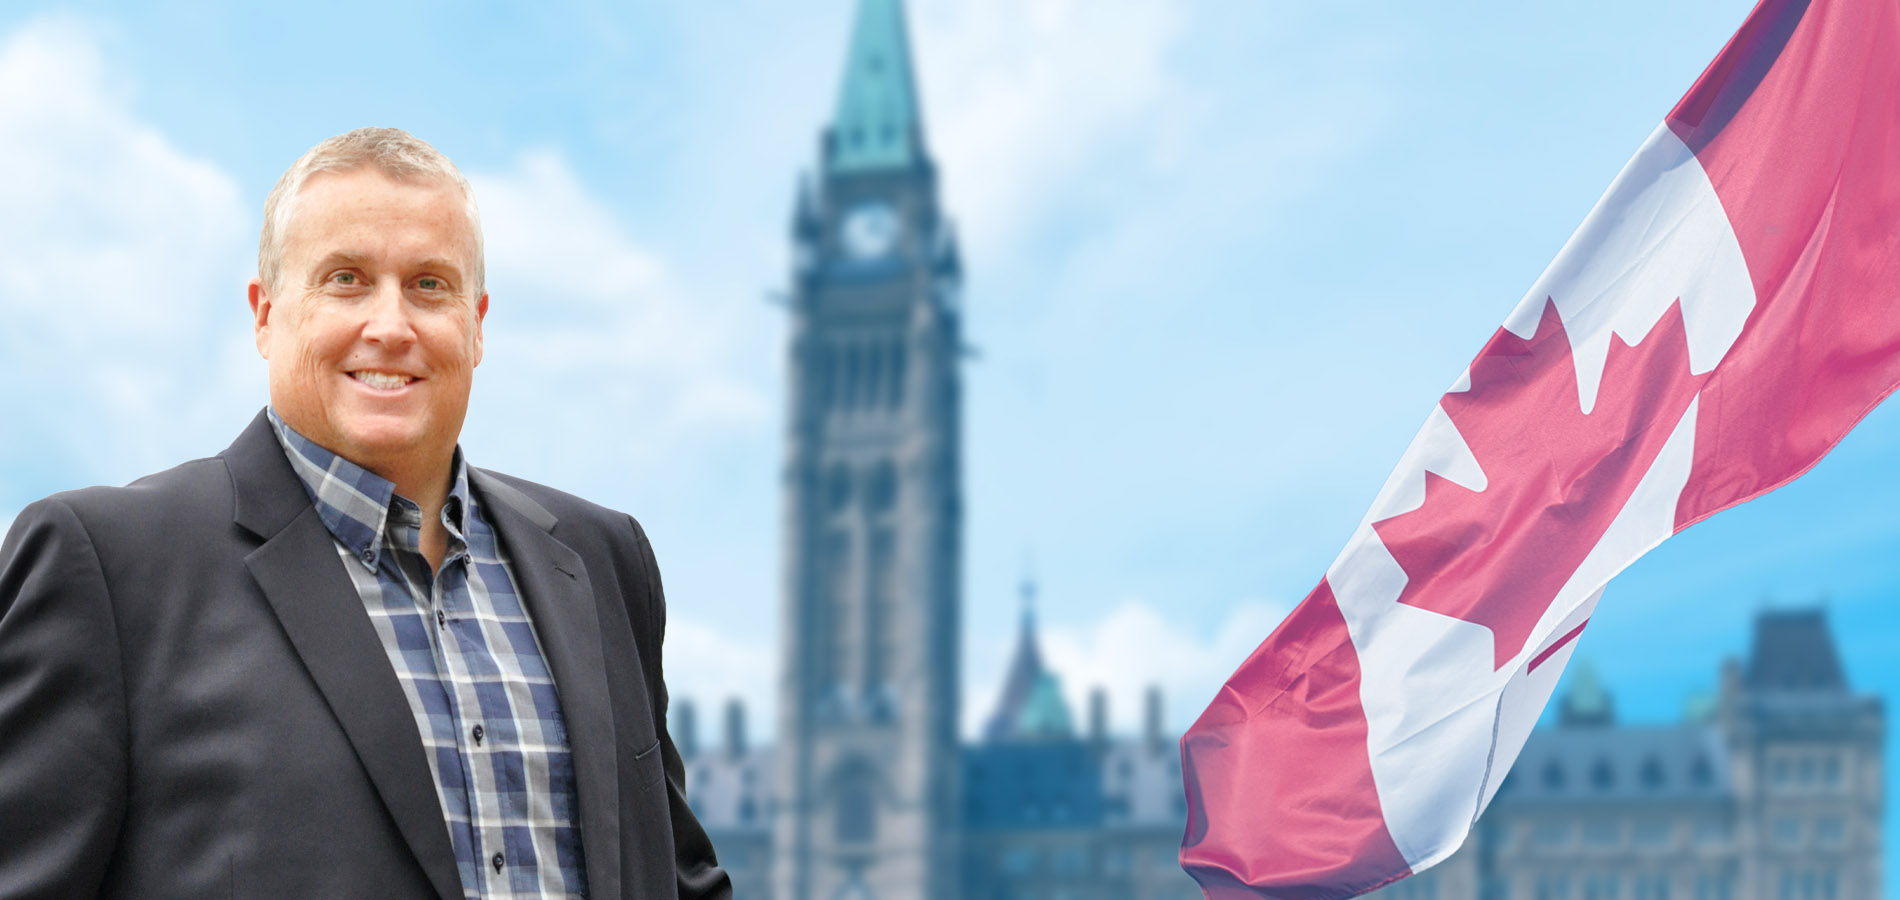 Home - Doug Shipley, MP